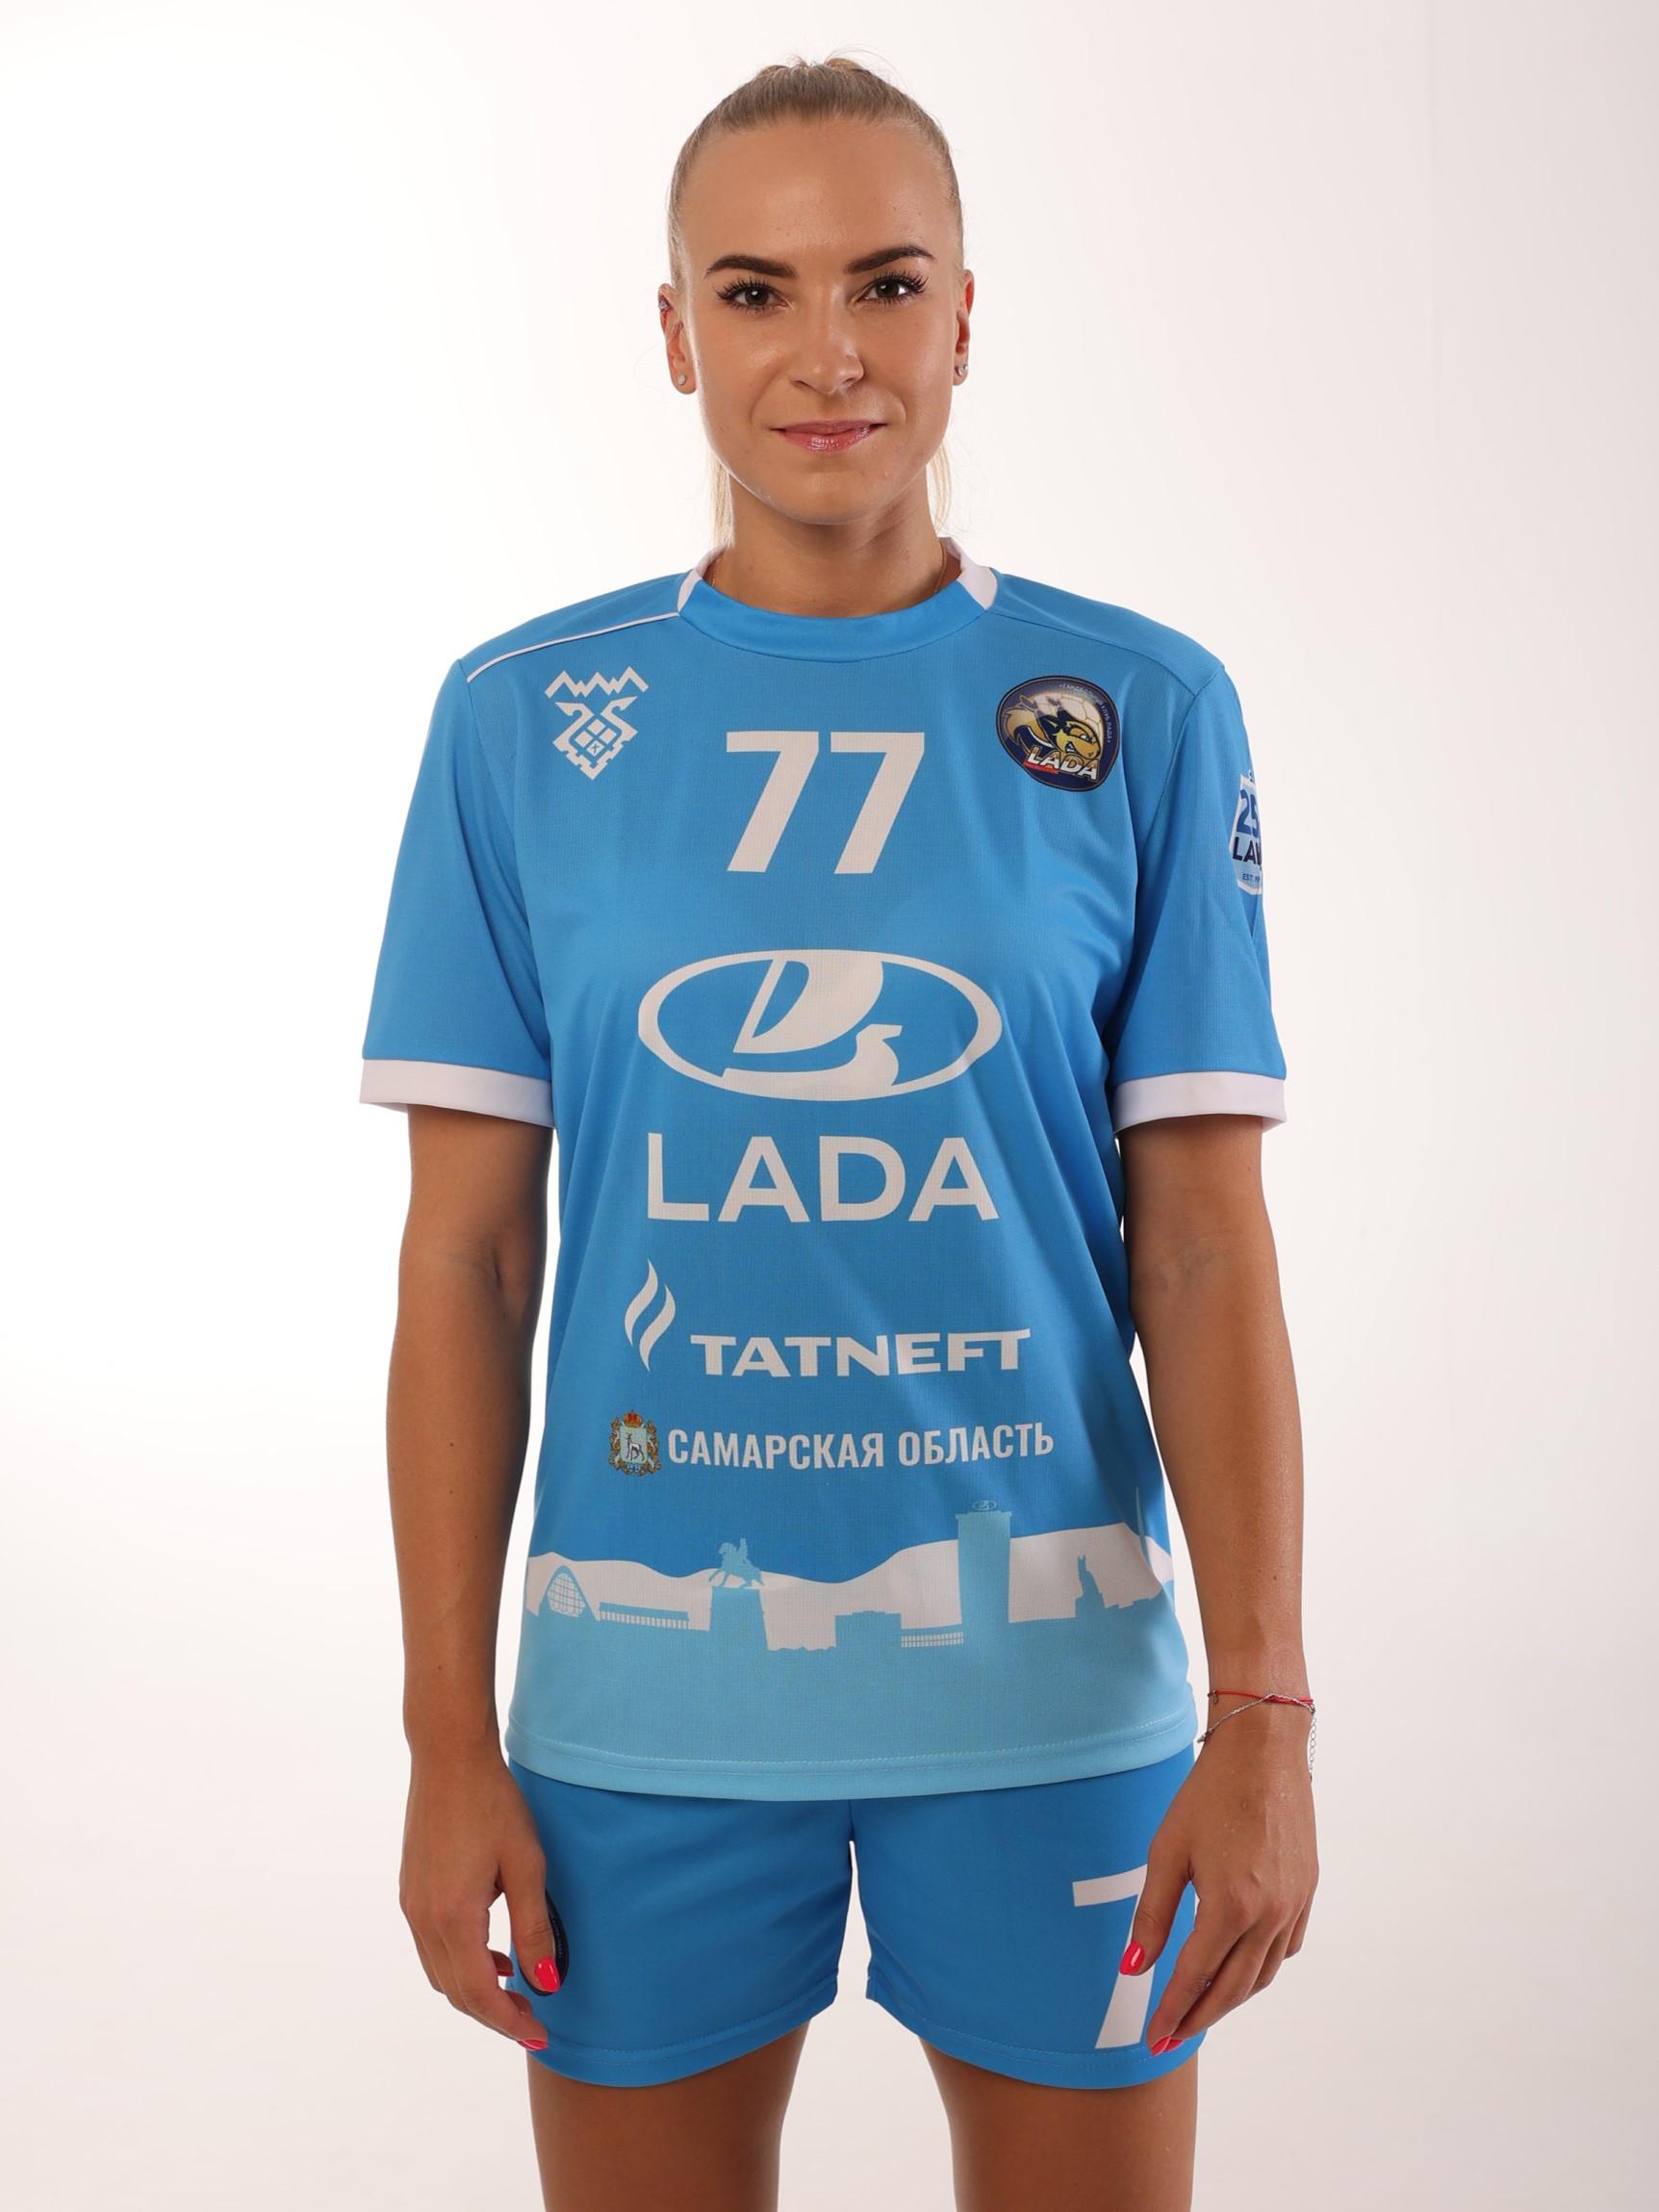 Никитина Ирина Витальевна